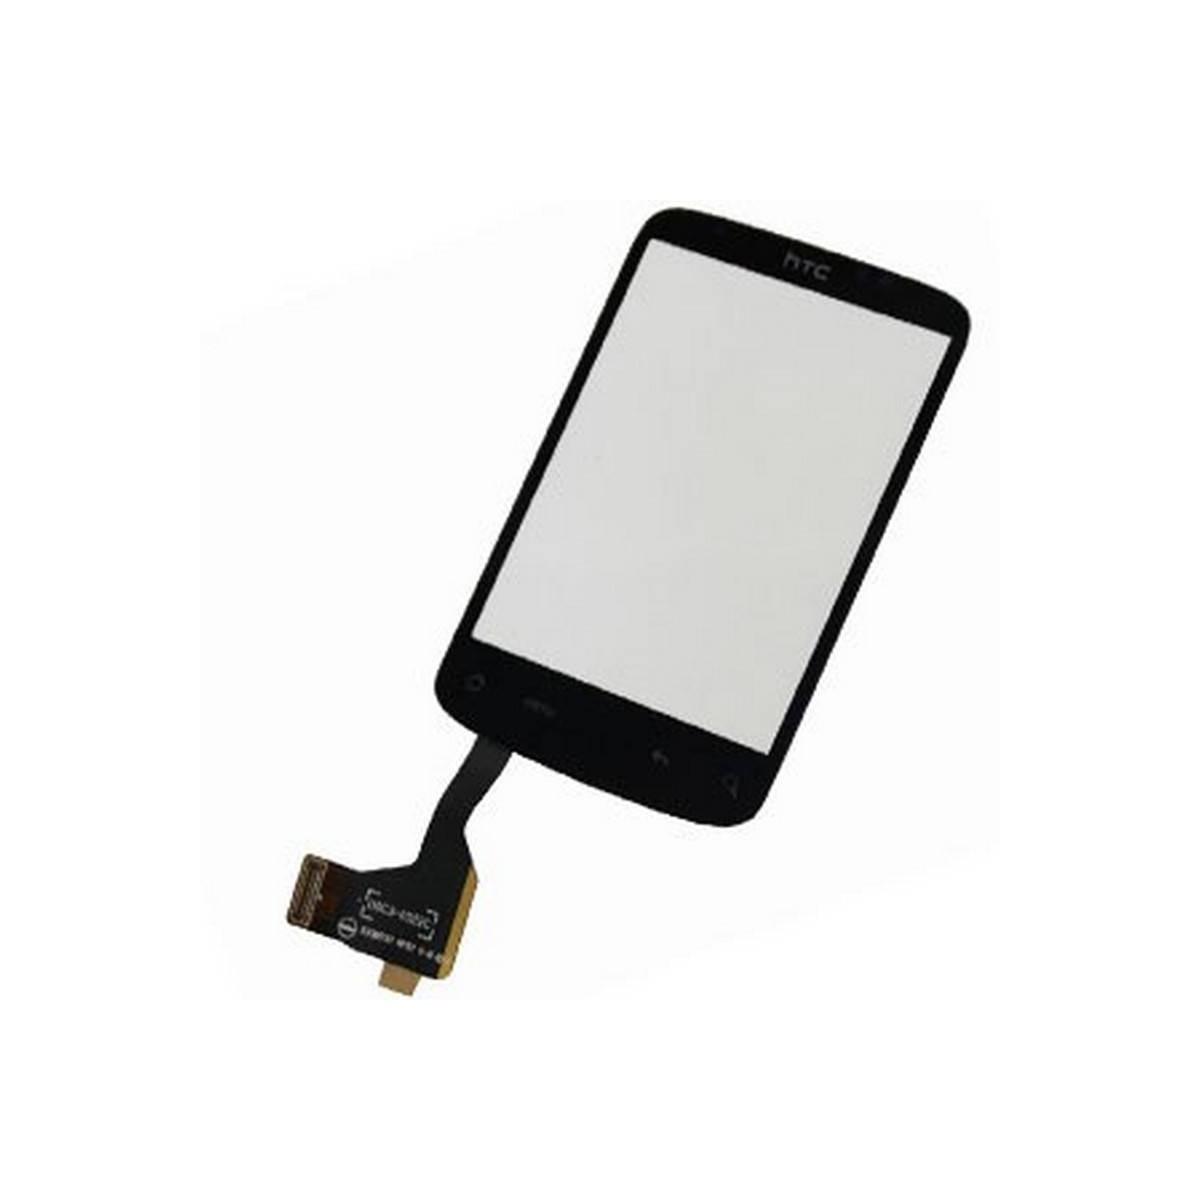 Ecrã táctil (Digitalizador) sin chip de HTC Wildfire A3333, Google G8